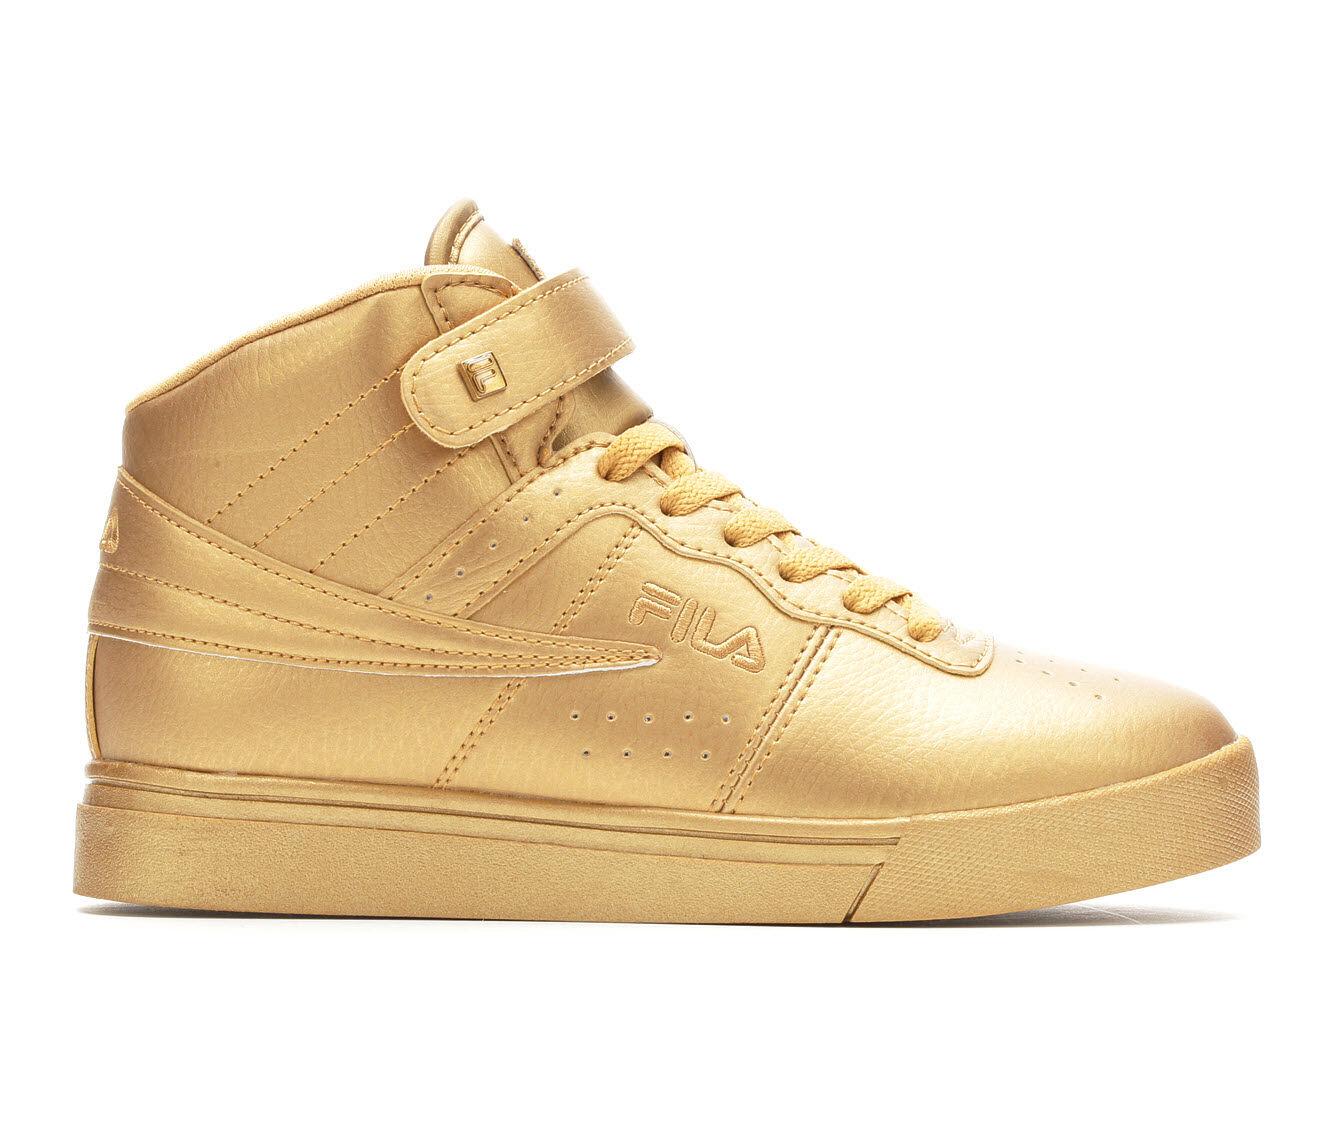 Fila Women's Disruptor II White Sneaker Review – ahlivia's